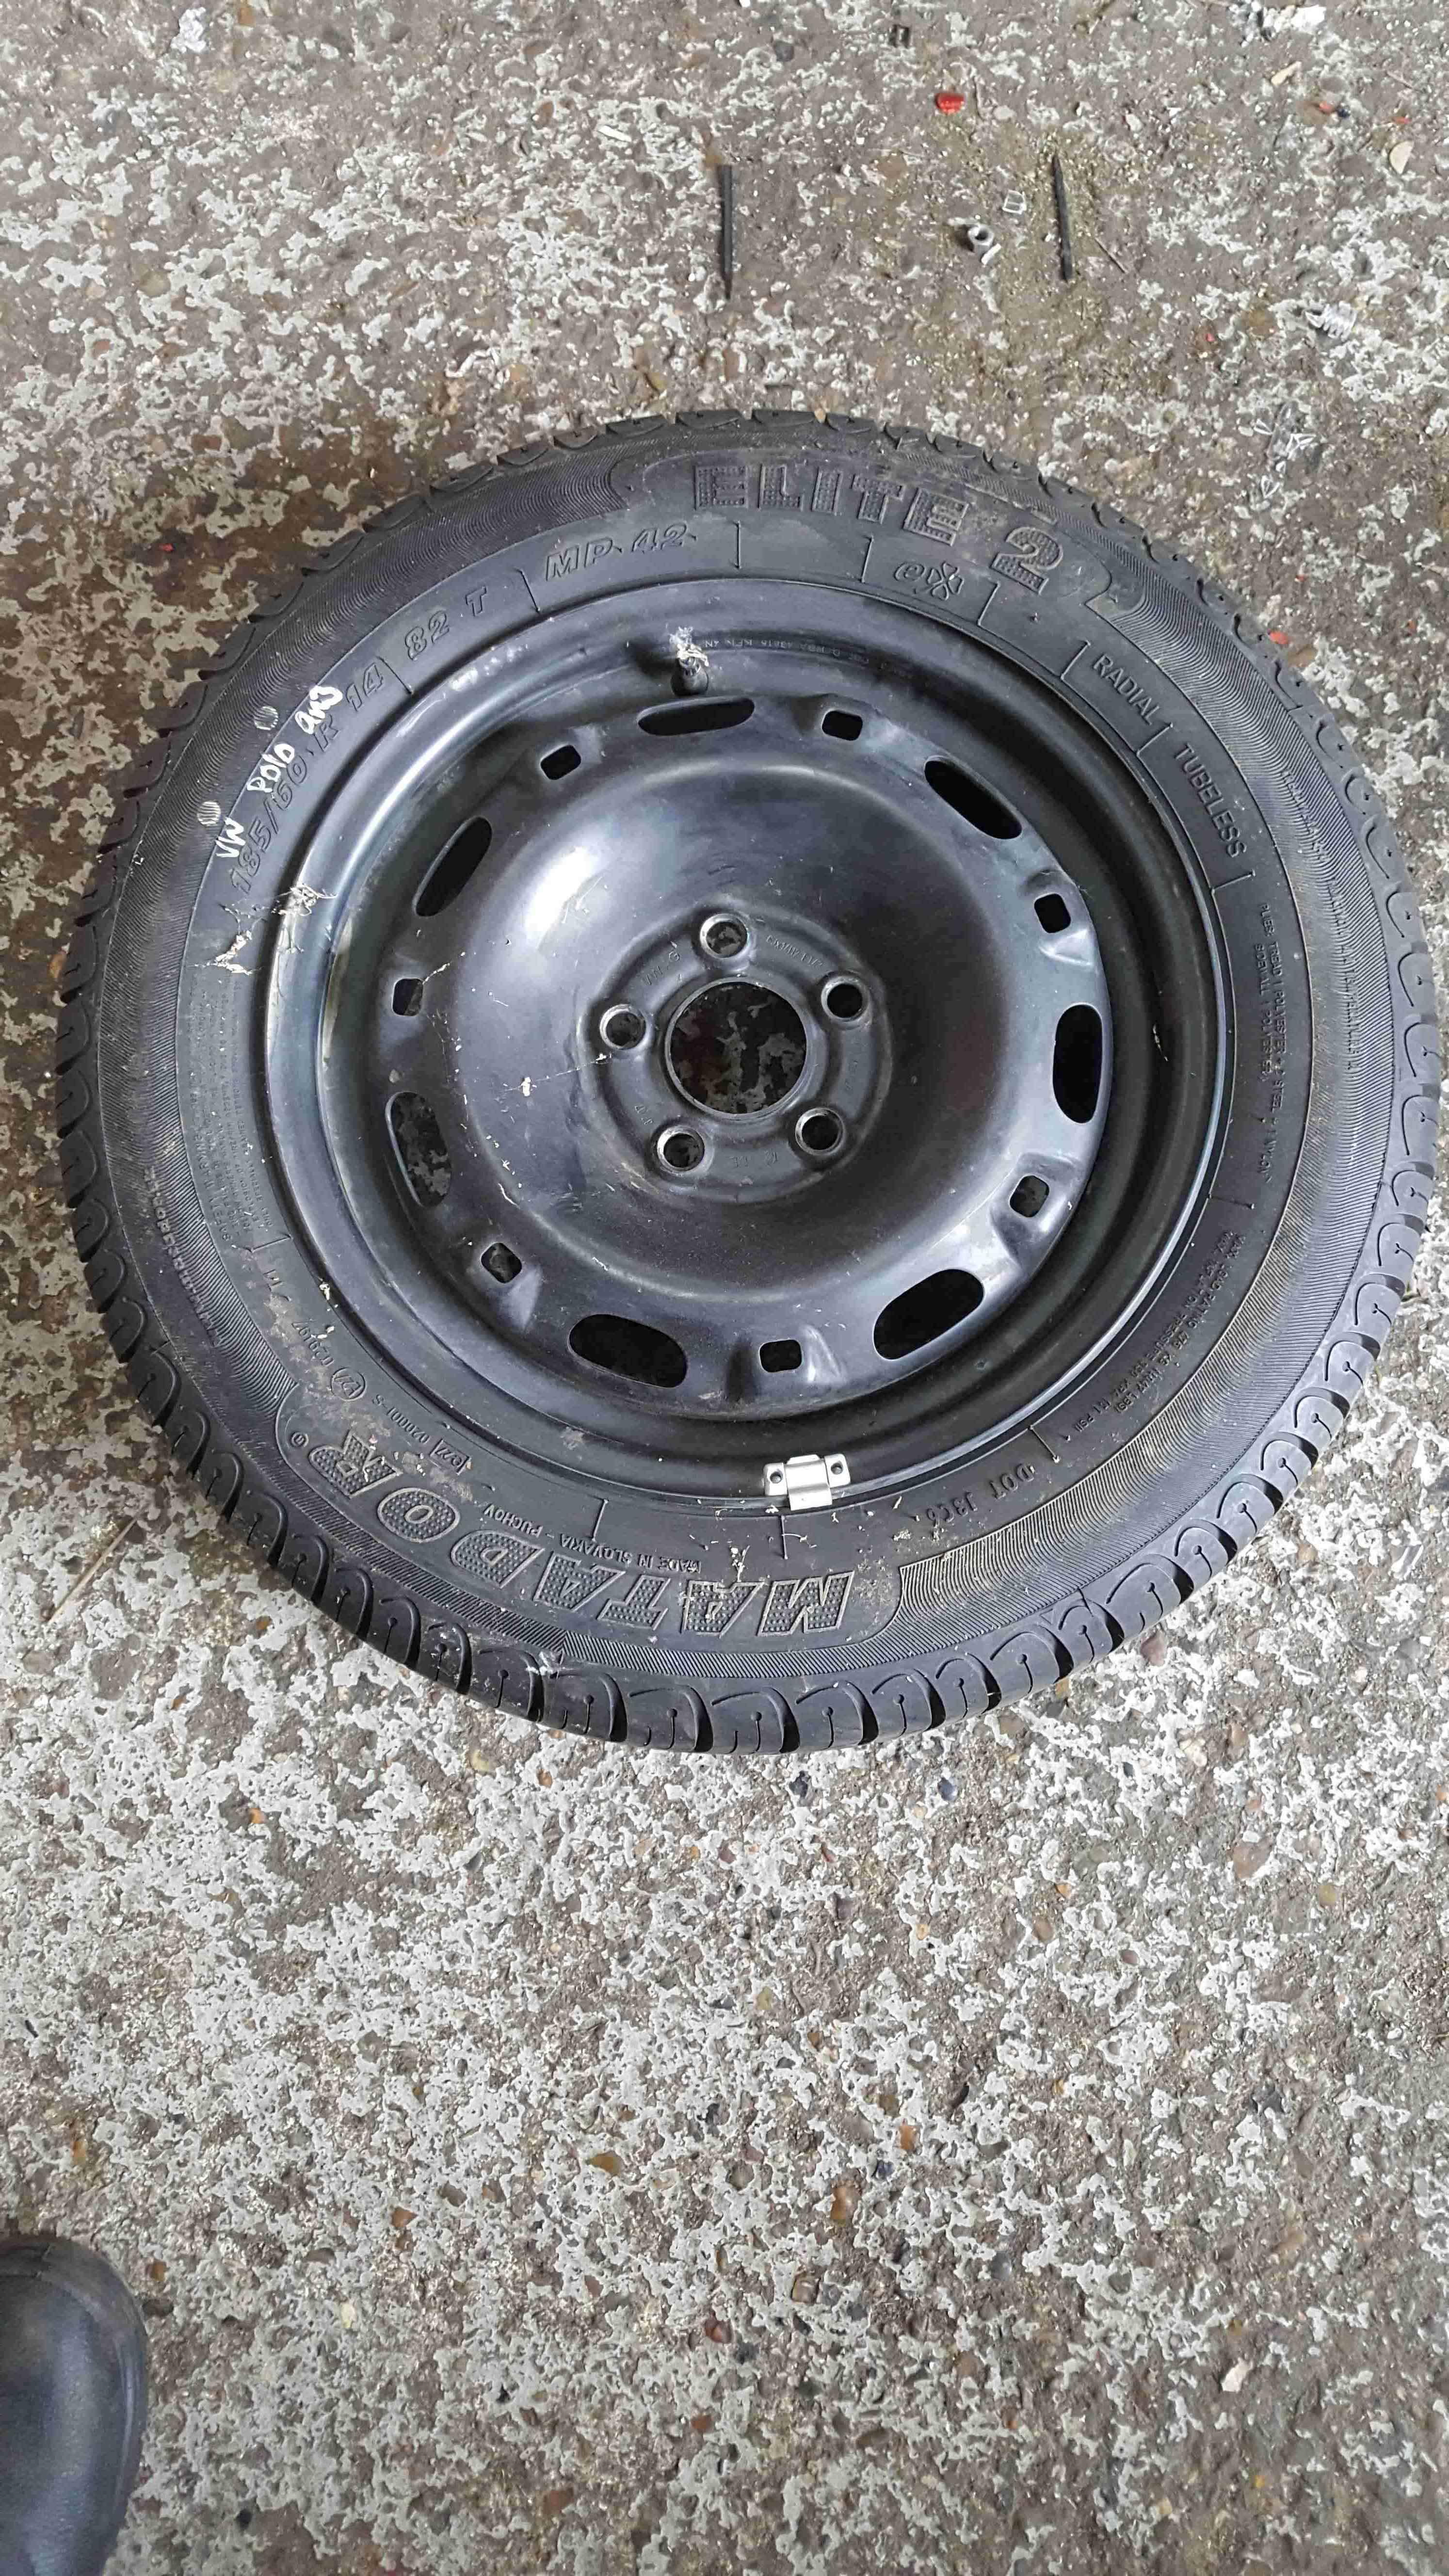 Volkswagen Polo 9N3 2006-2008 Steel Wheel Rim + Tyre 185 60 14 8mm